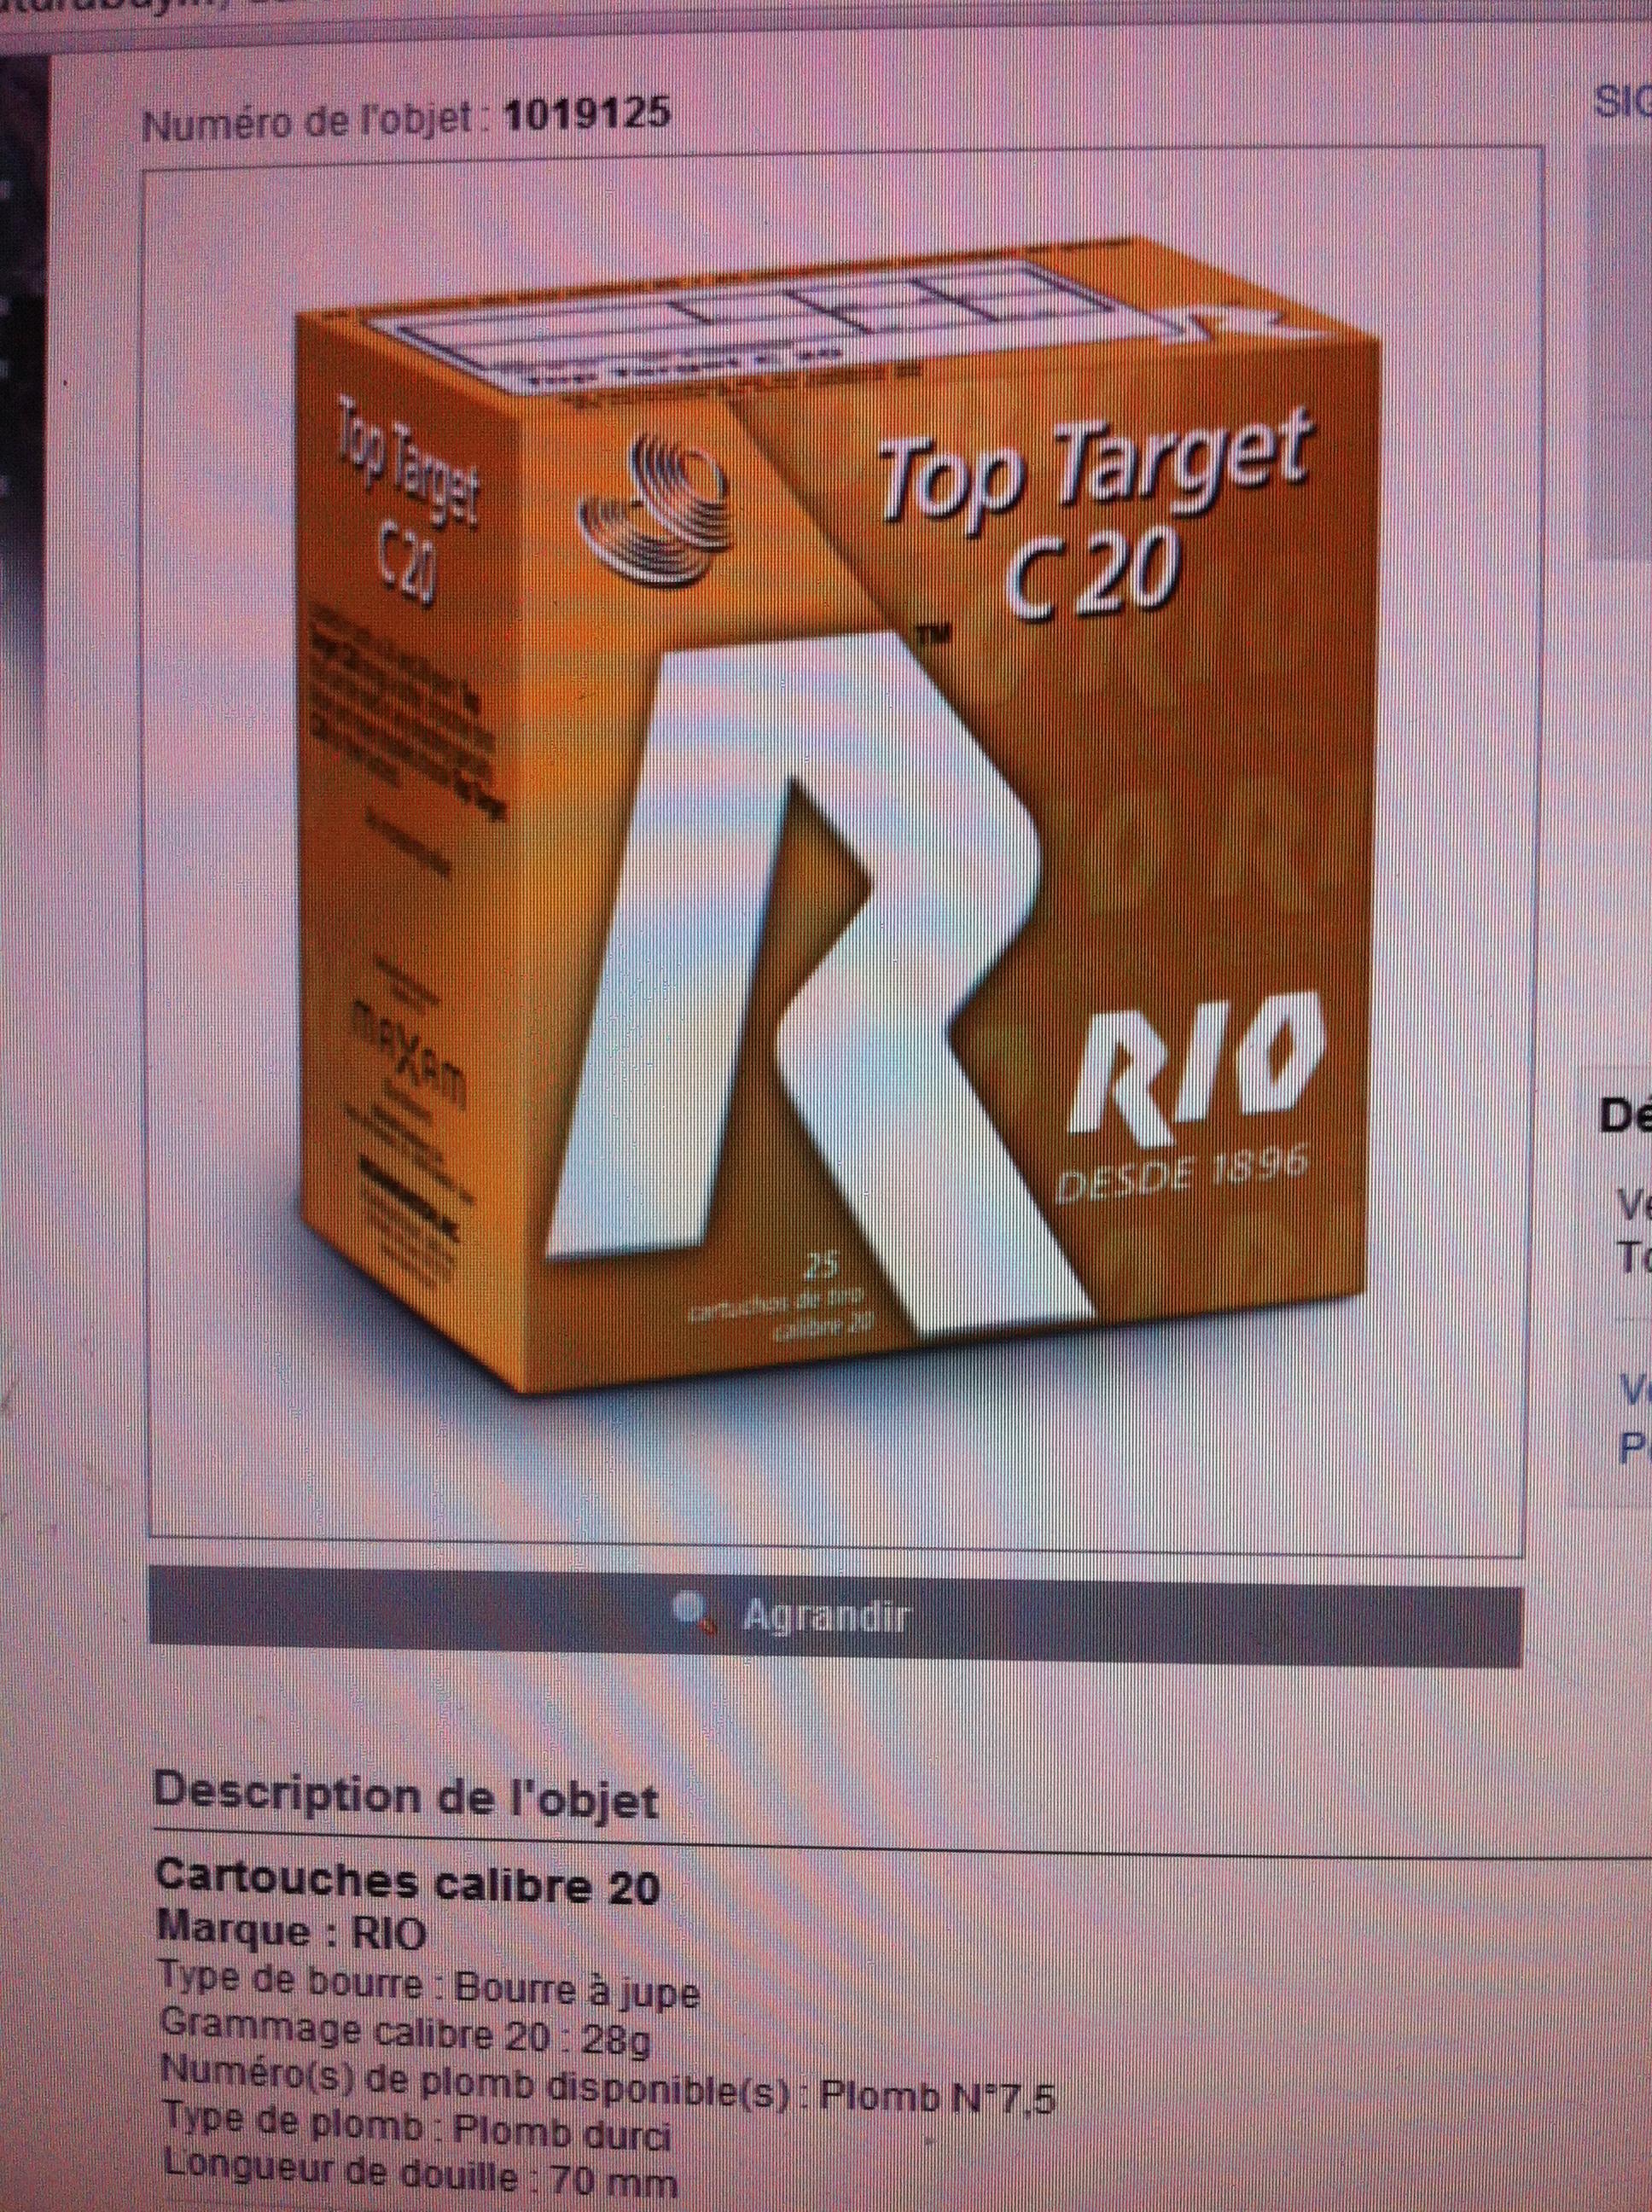 Cartouche Rio top target cal 20 ... 1361876135-iphone-image-02-26-2013